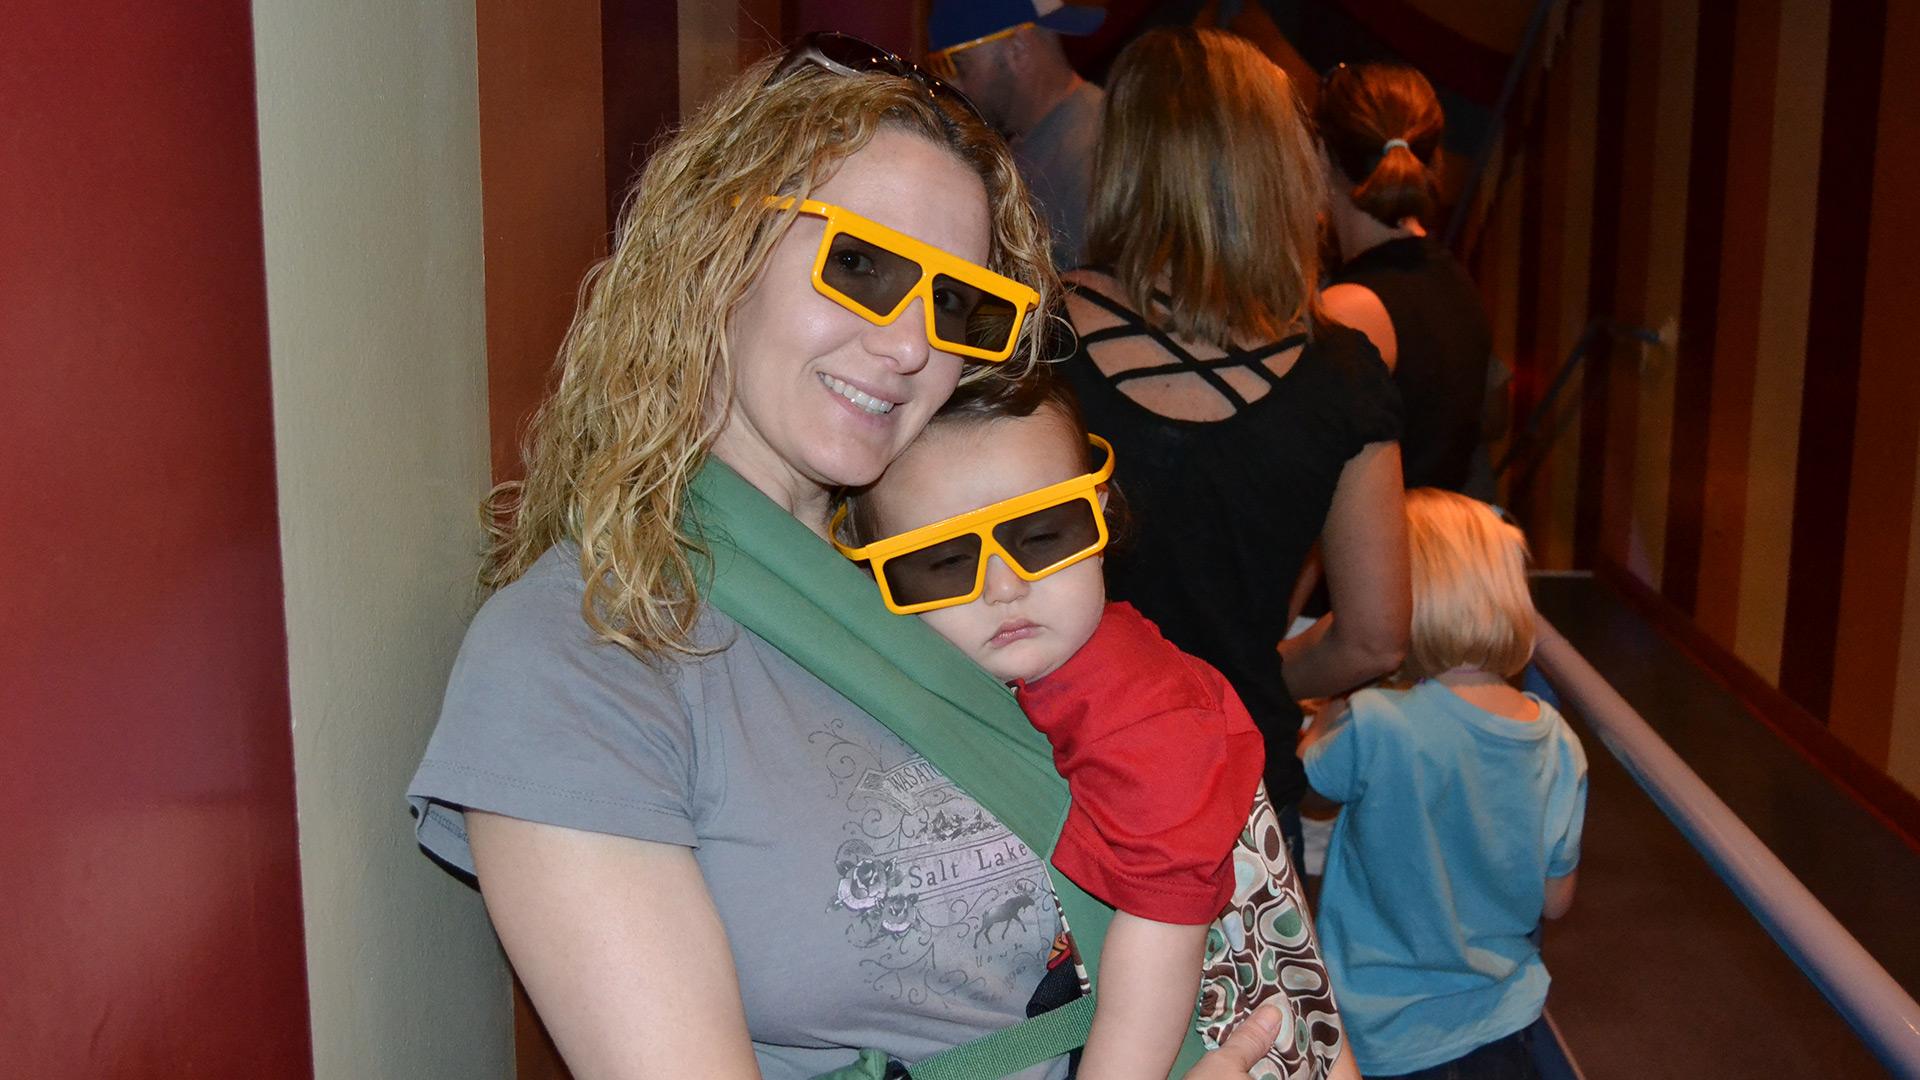 Rebecca Bahret with pitiful child   Sheknows.com